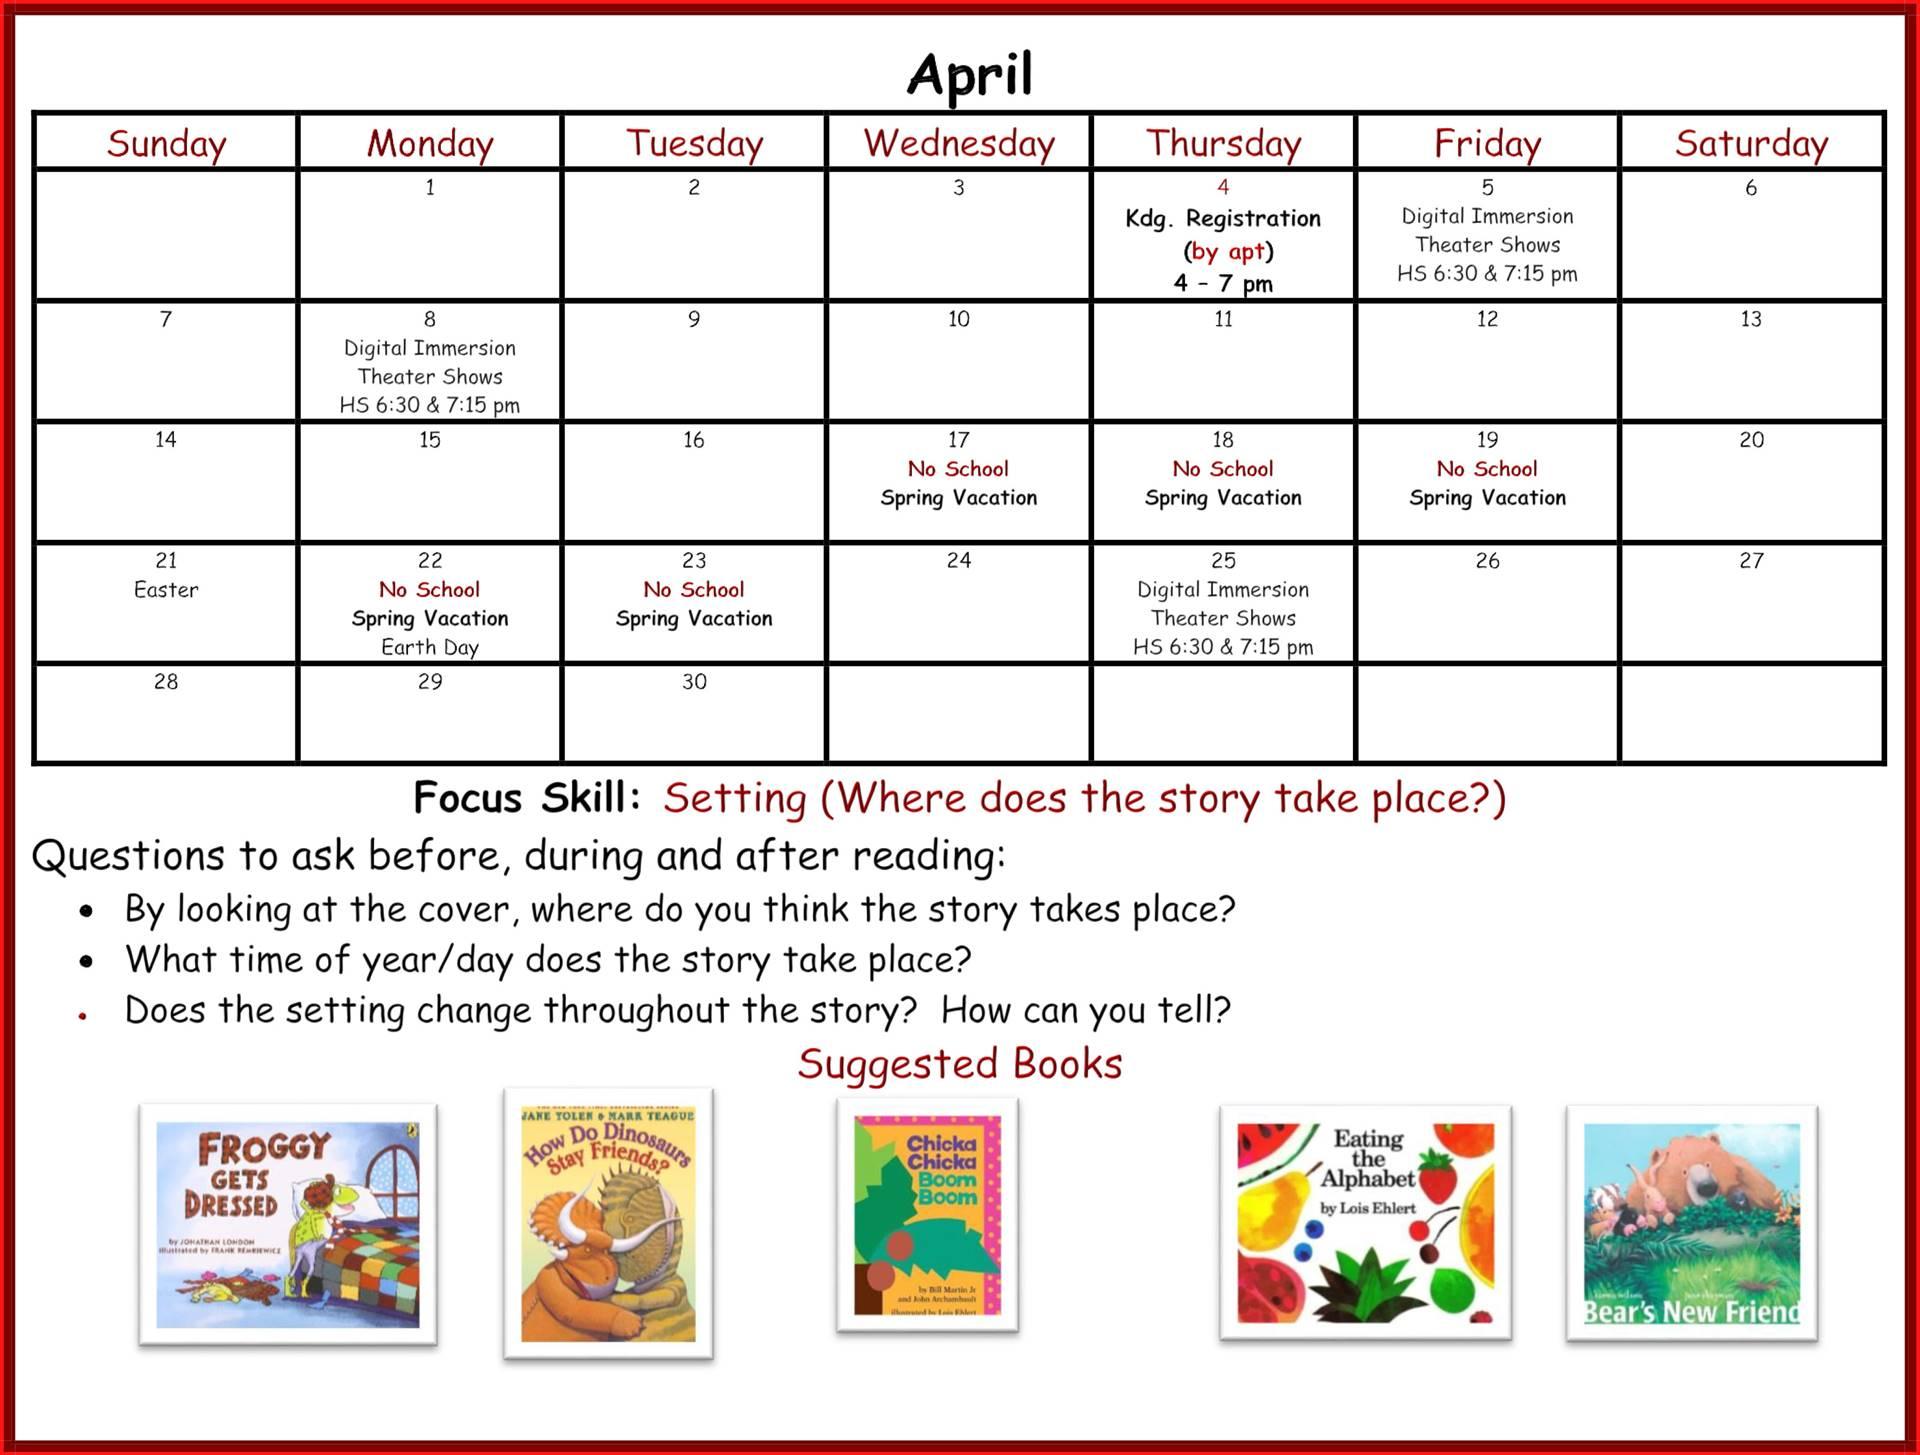 Kindergarten Readiness Calendar - April page 1